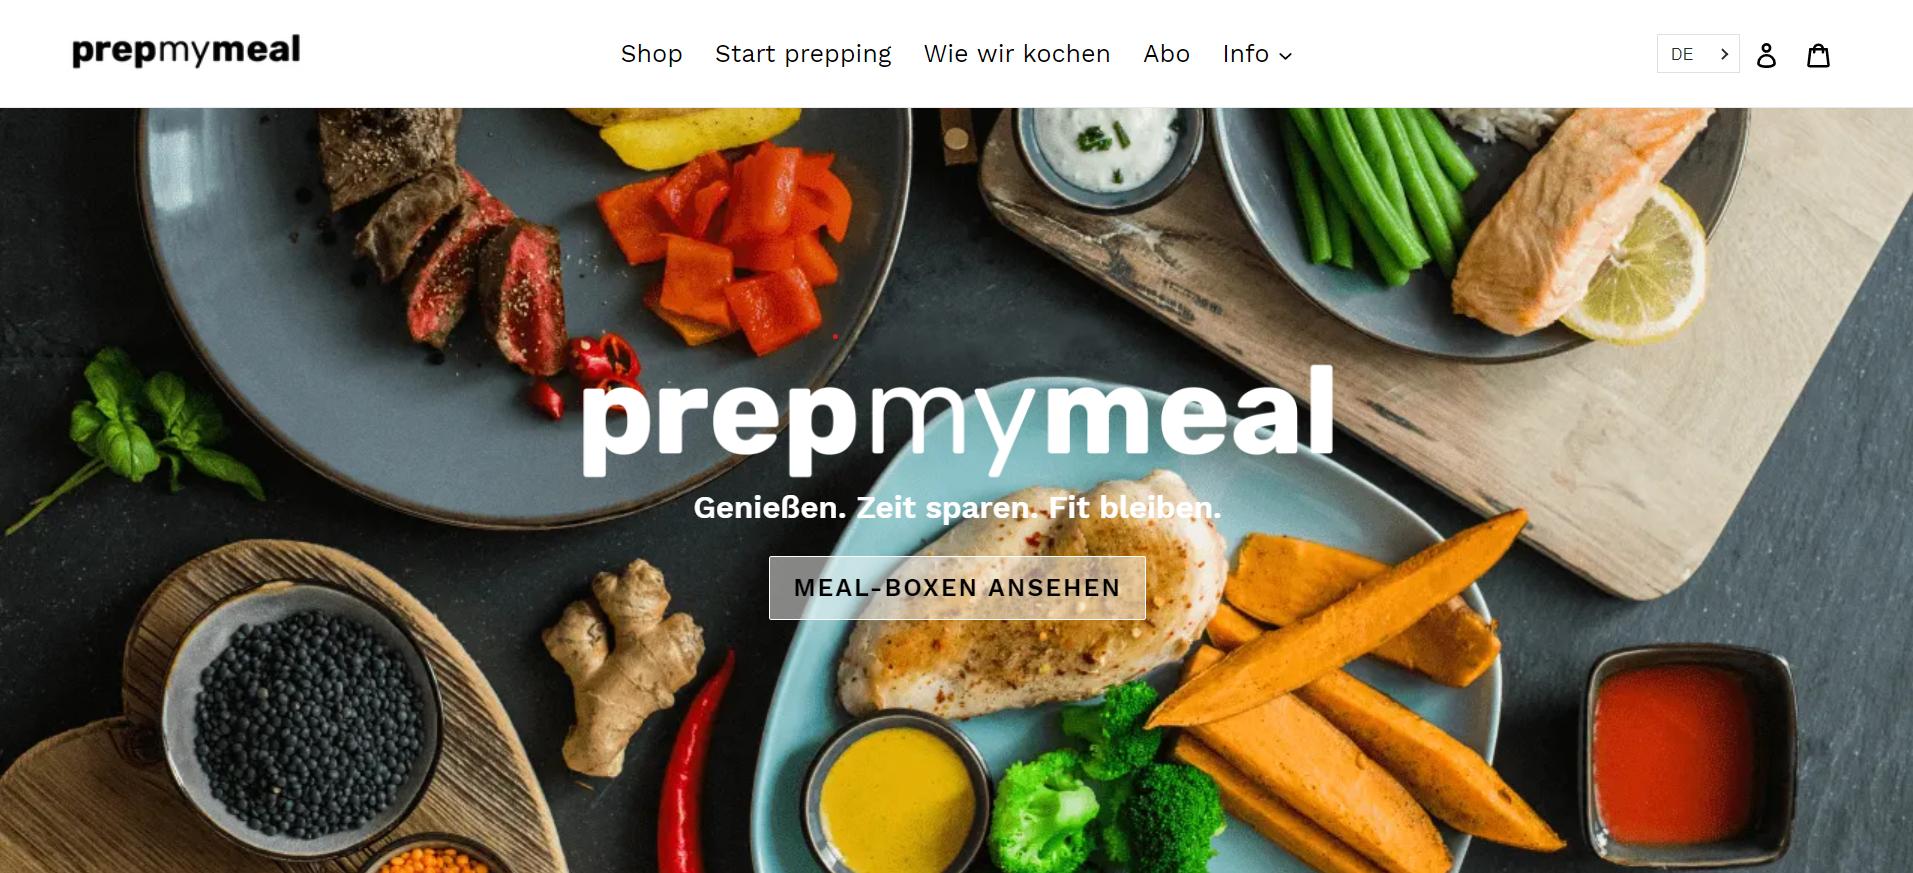 prepmymeal-website